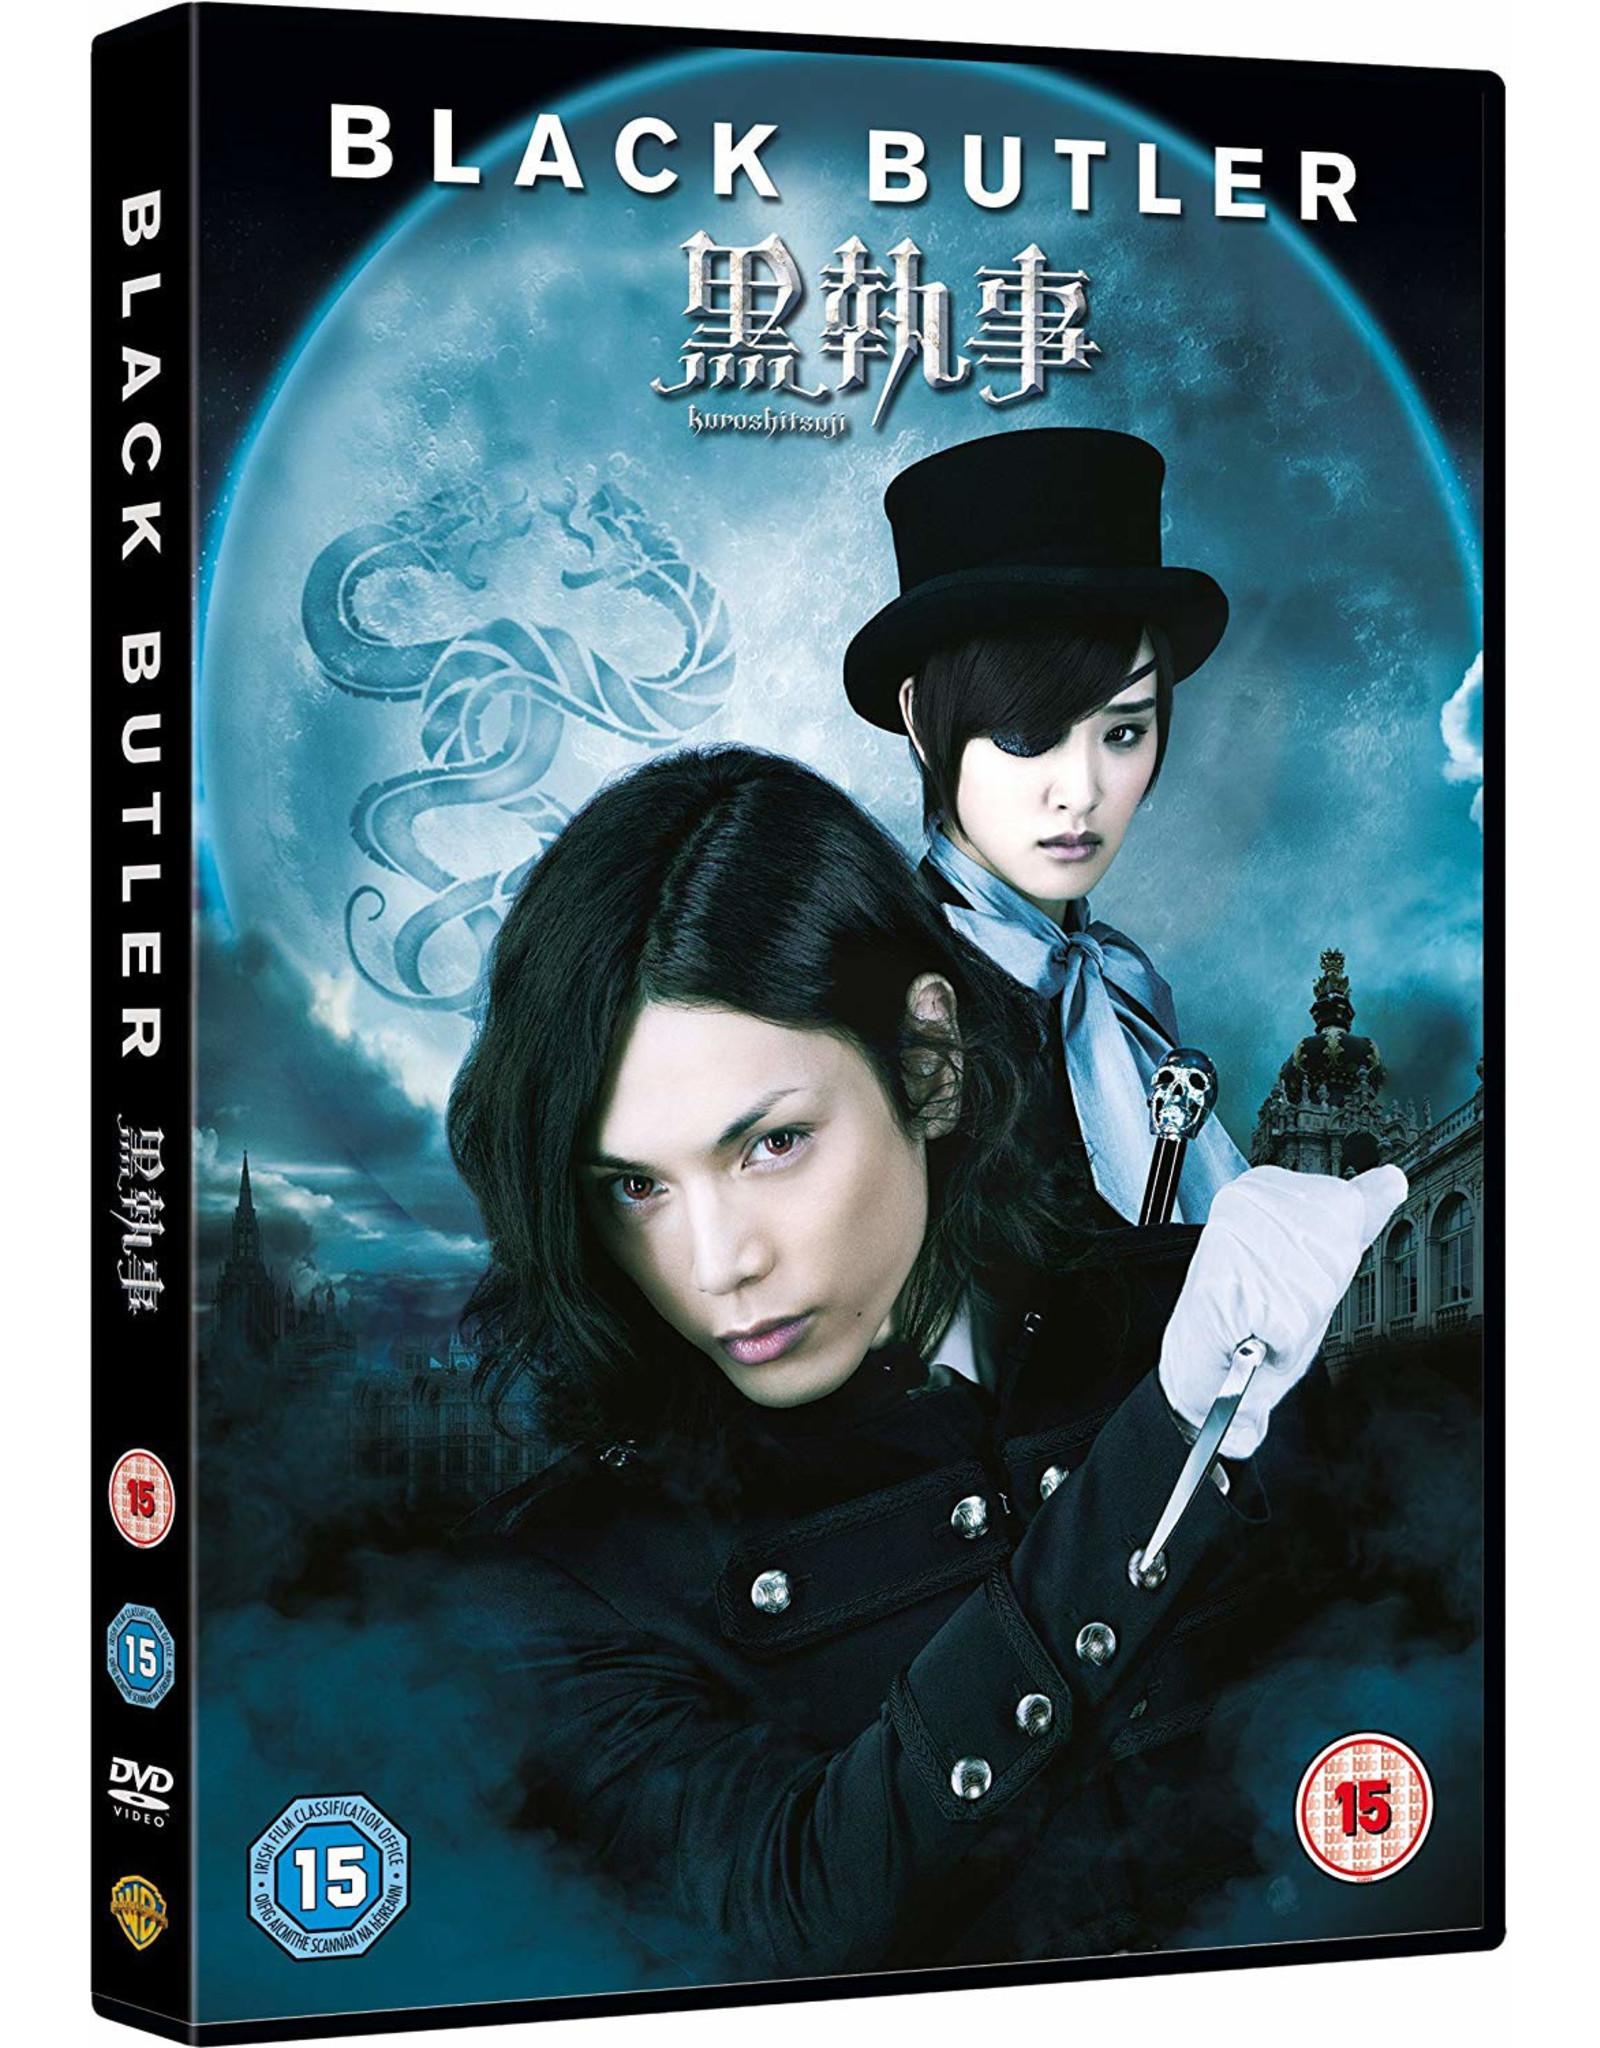 Black Butler (DVD) - (Engelstalige ondertitels)